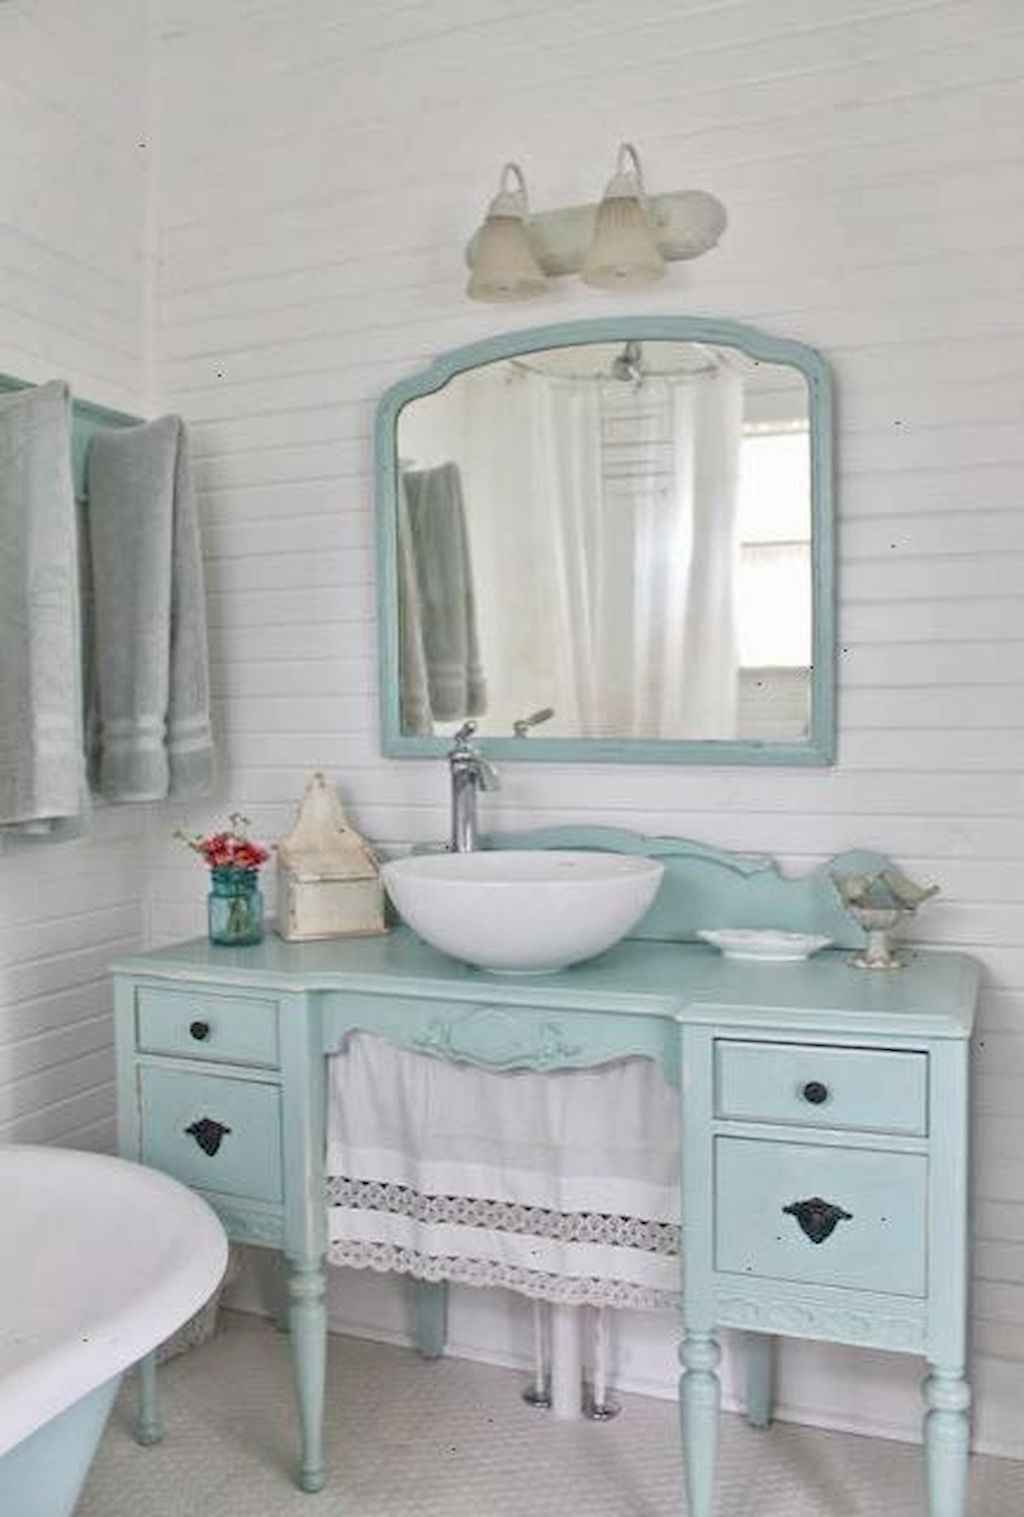 59 Cozy Shabby Chic Style Bathroom Decor Ideas In 2020 Chic Bathroom Decor Shabby Chic Bathroom Decor Shabby Chic Bathroom